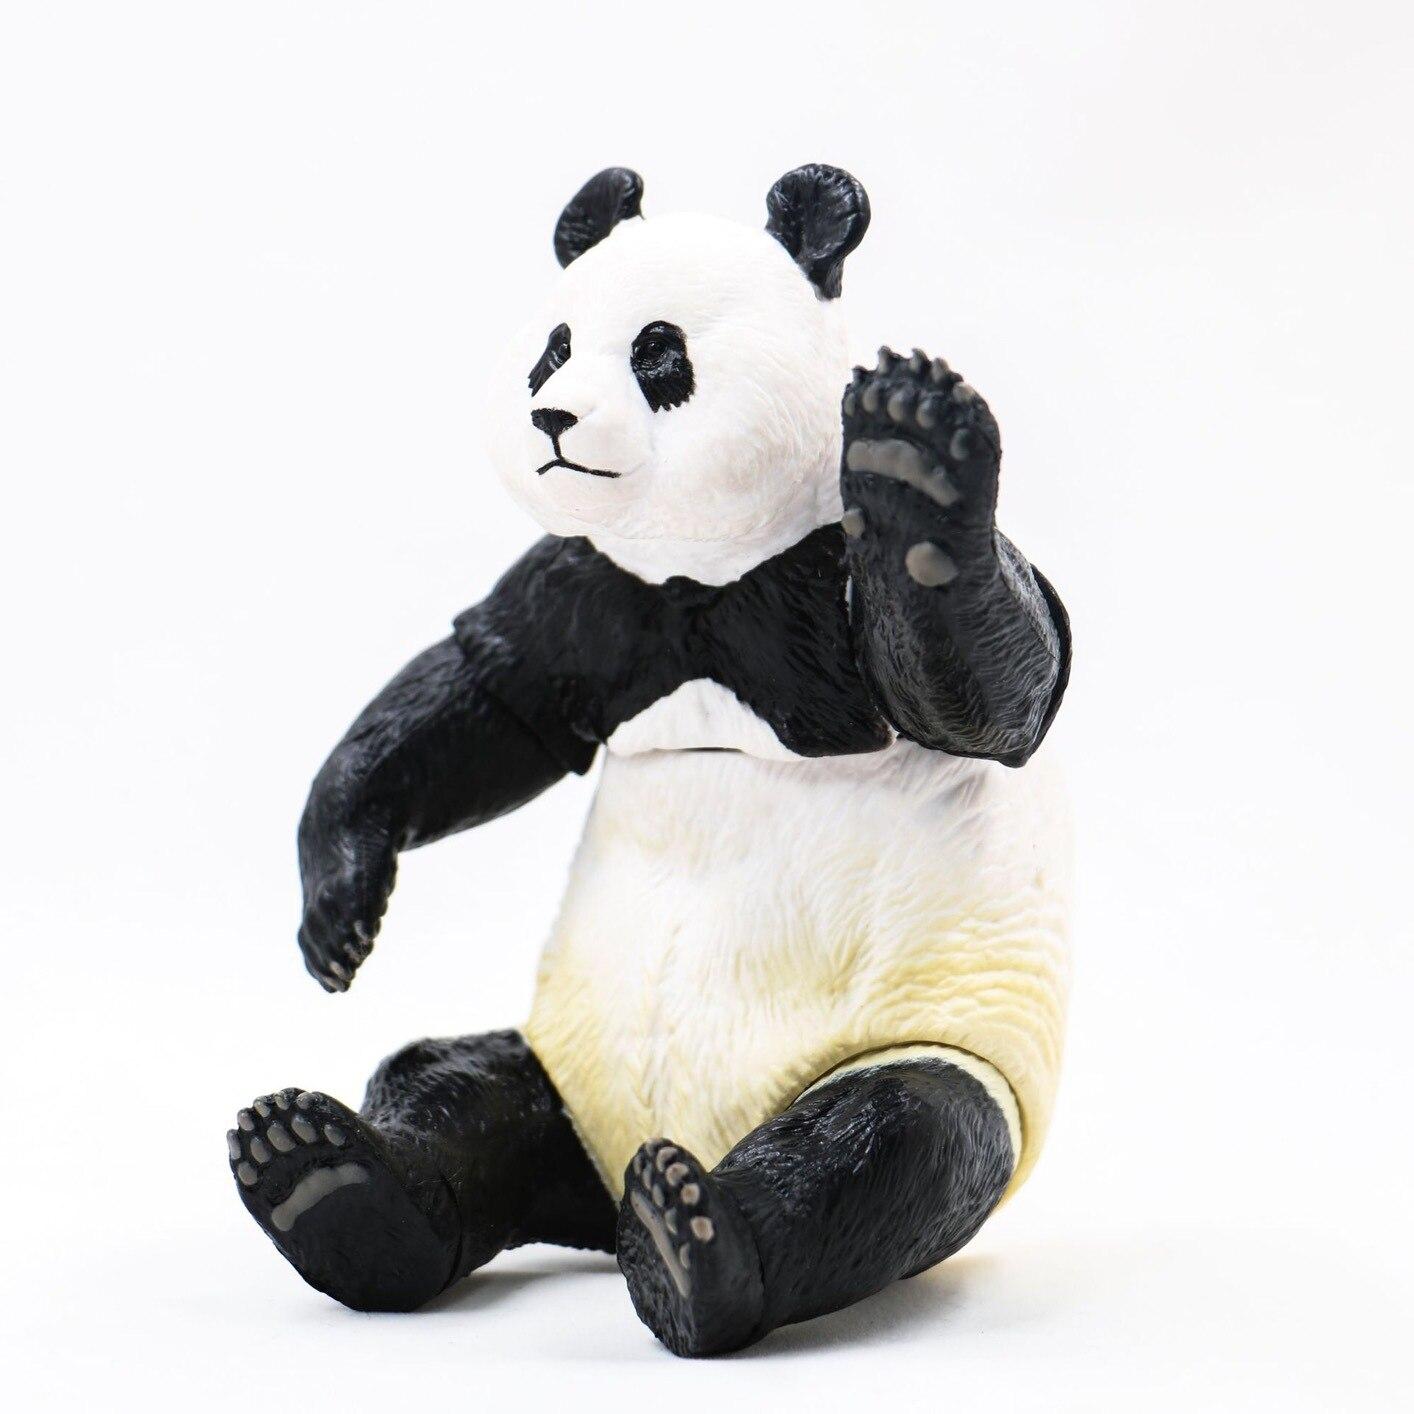 Donghong Anime shan kou shi Box003 Adorable lindo chico Panda Tesoro Nacional móvil garaje Kit de modelo